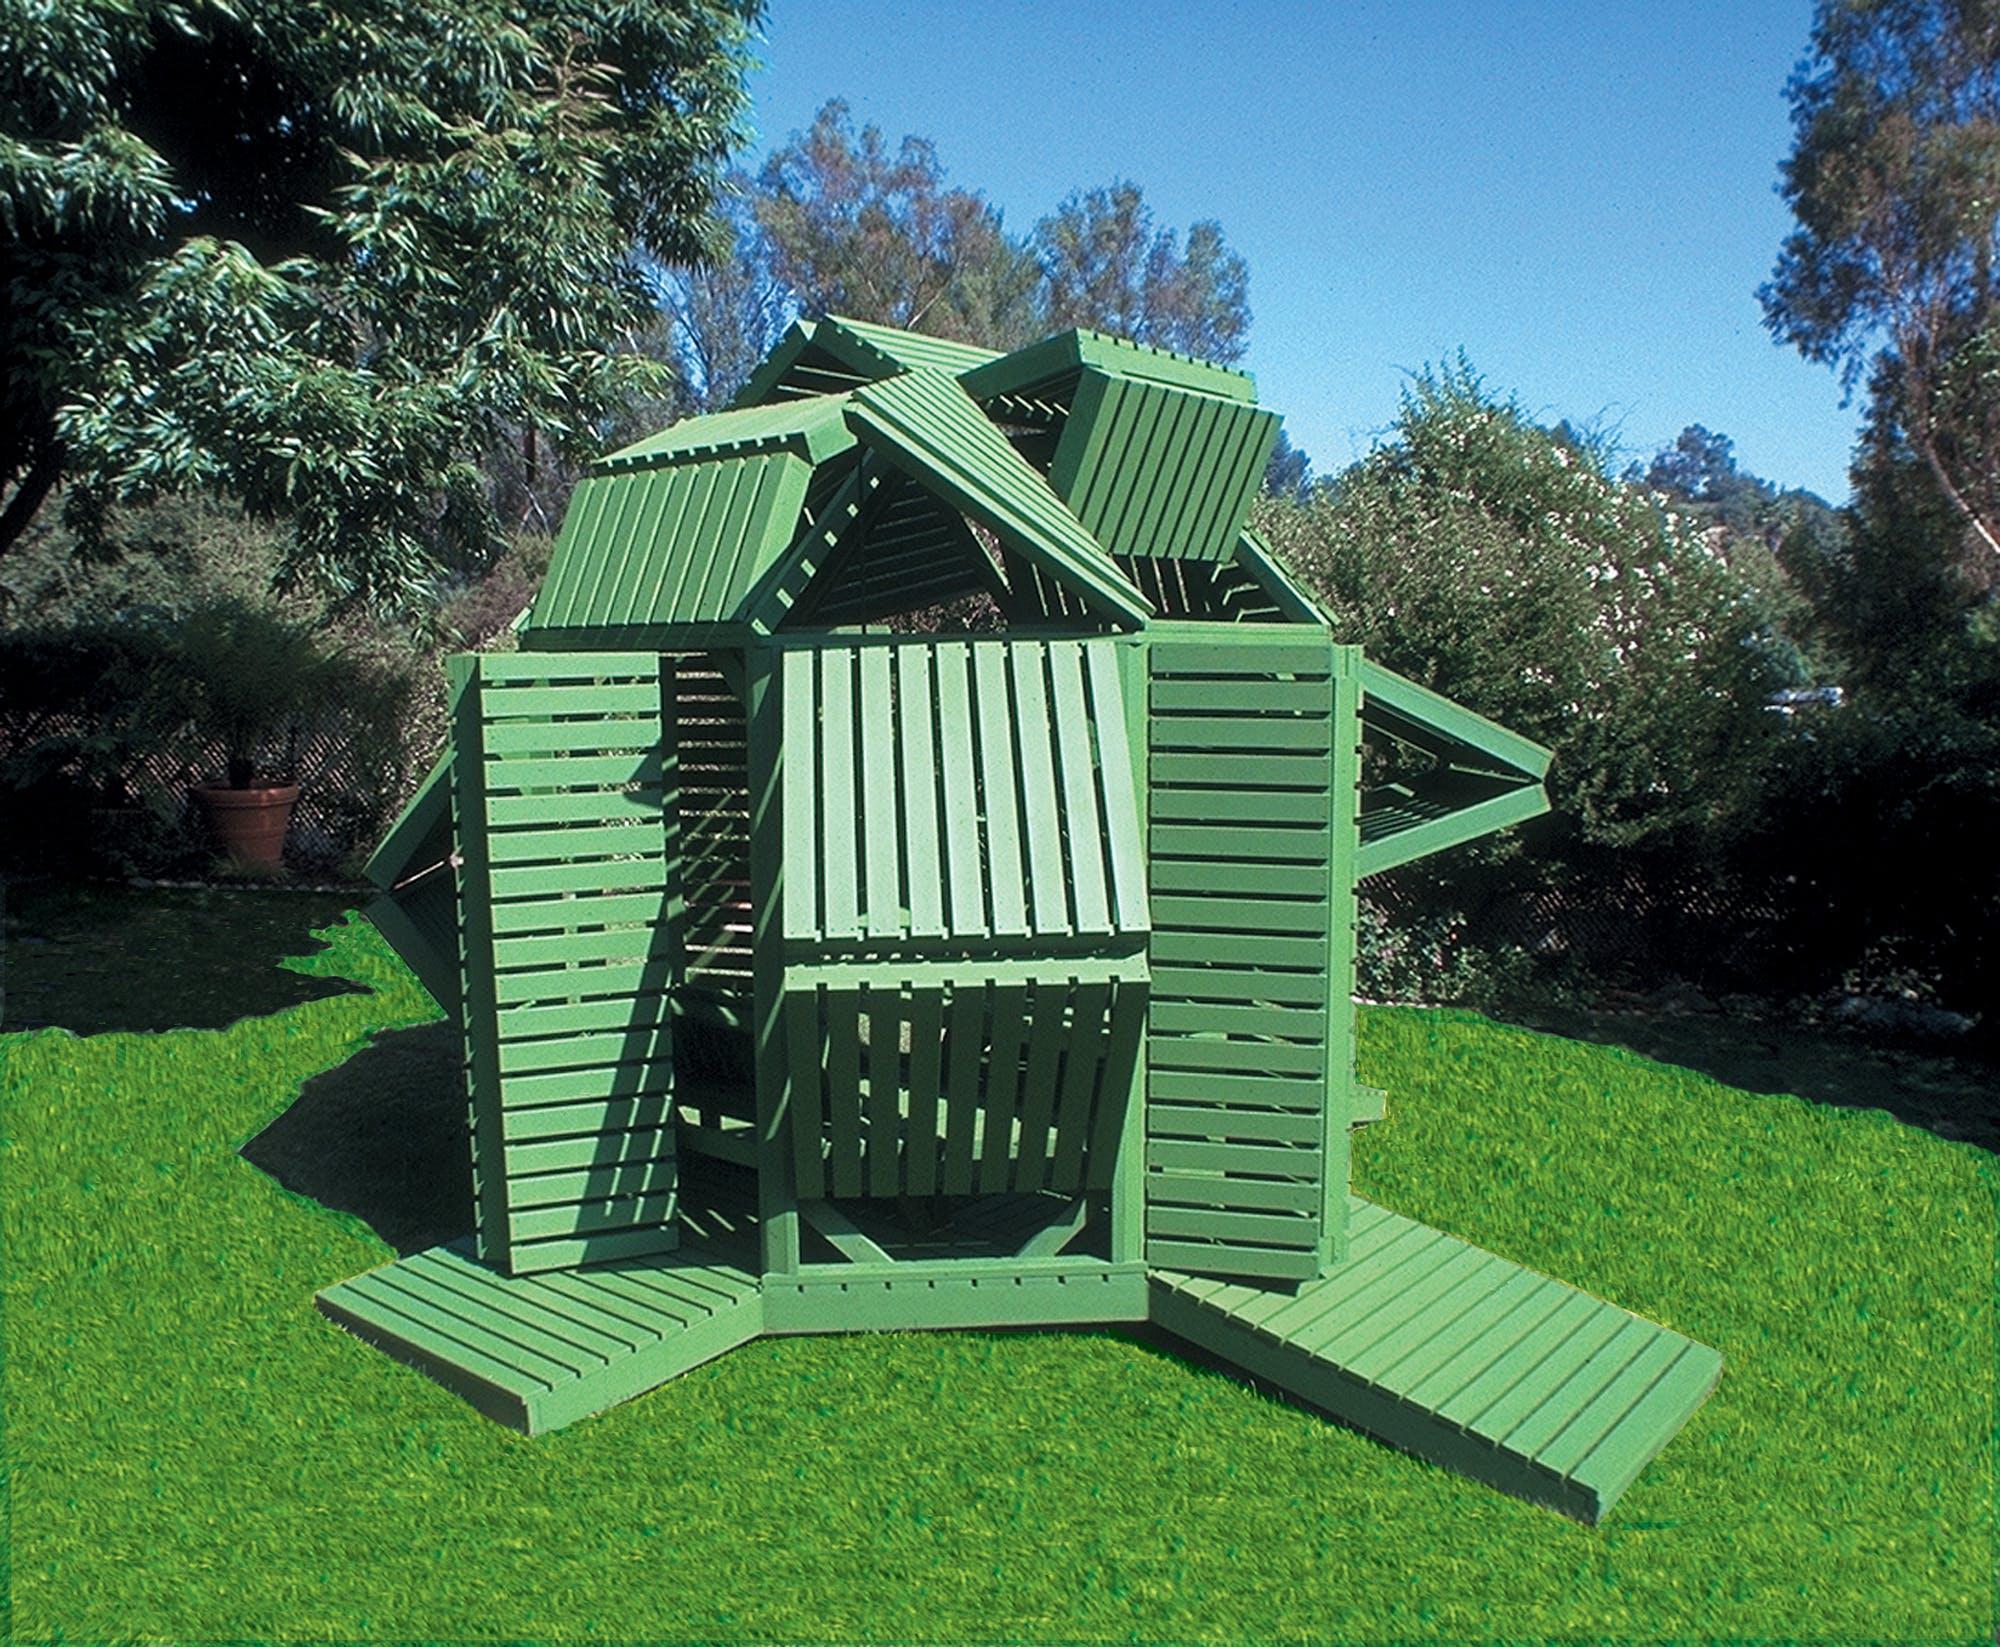 Michael Jantzen S Interactive Octagonal Garden Pavilion